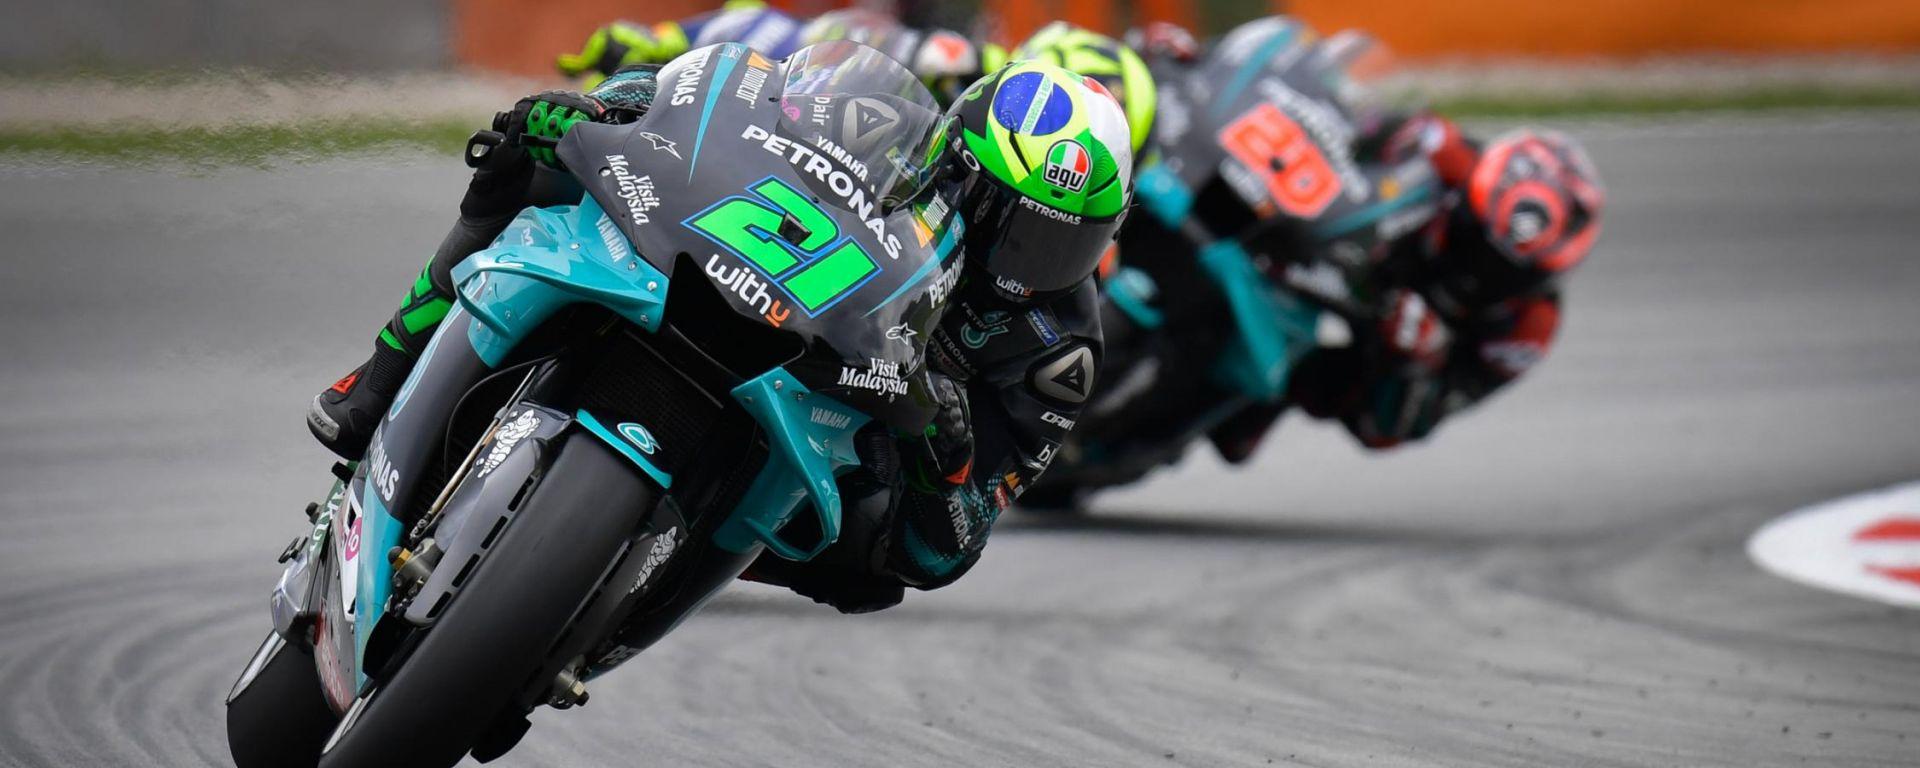 MotoGP Catalunya 2020, Morbidelli, Rossi e Quartararo (Yamaha)